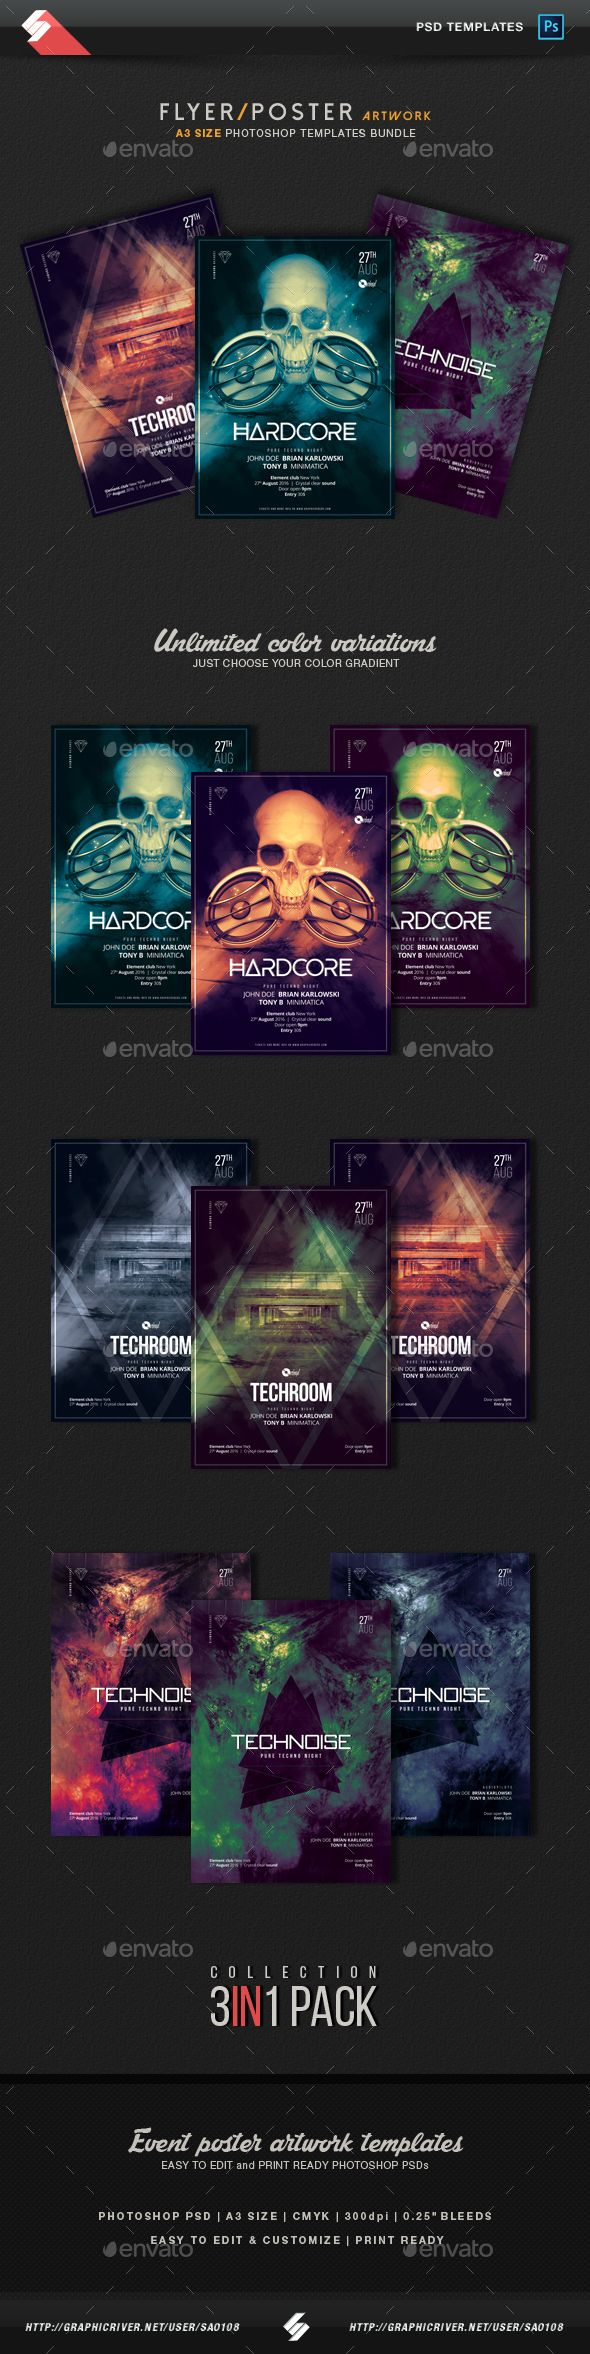 Techno Party Flyer / Poster Artwork Templates Bundle. Download here: https://graphicriver.net/item/techno-party-flyer-poster-artwork-templates-bundle/17282565?ref=ksioks